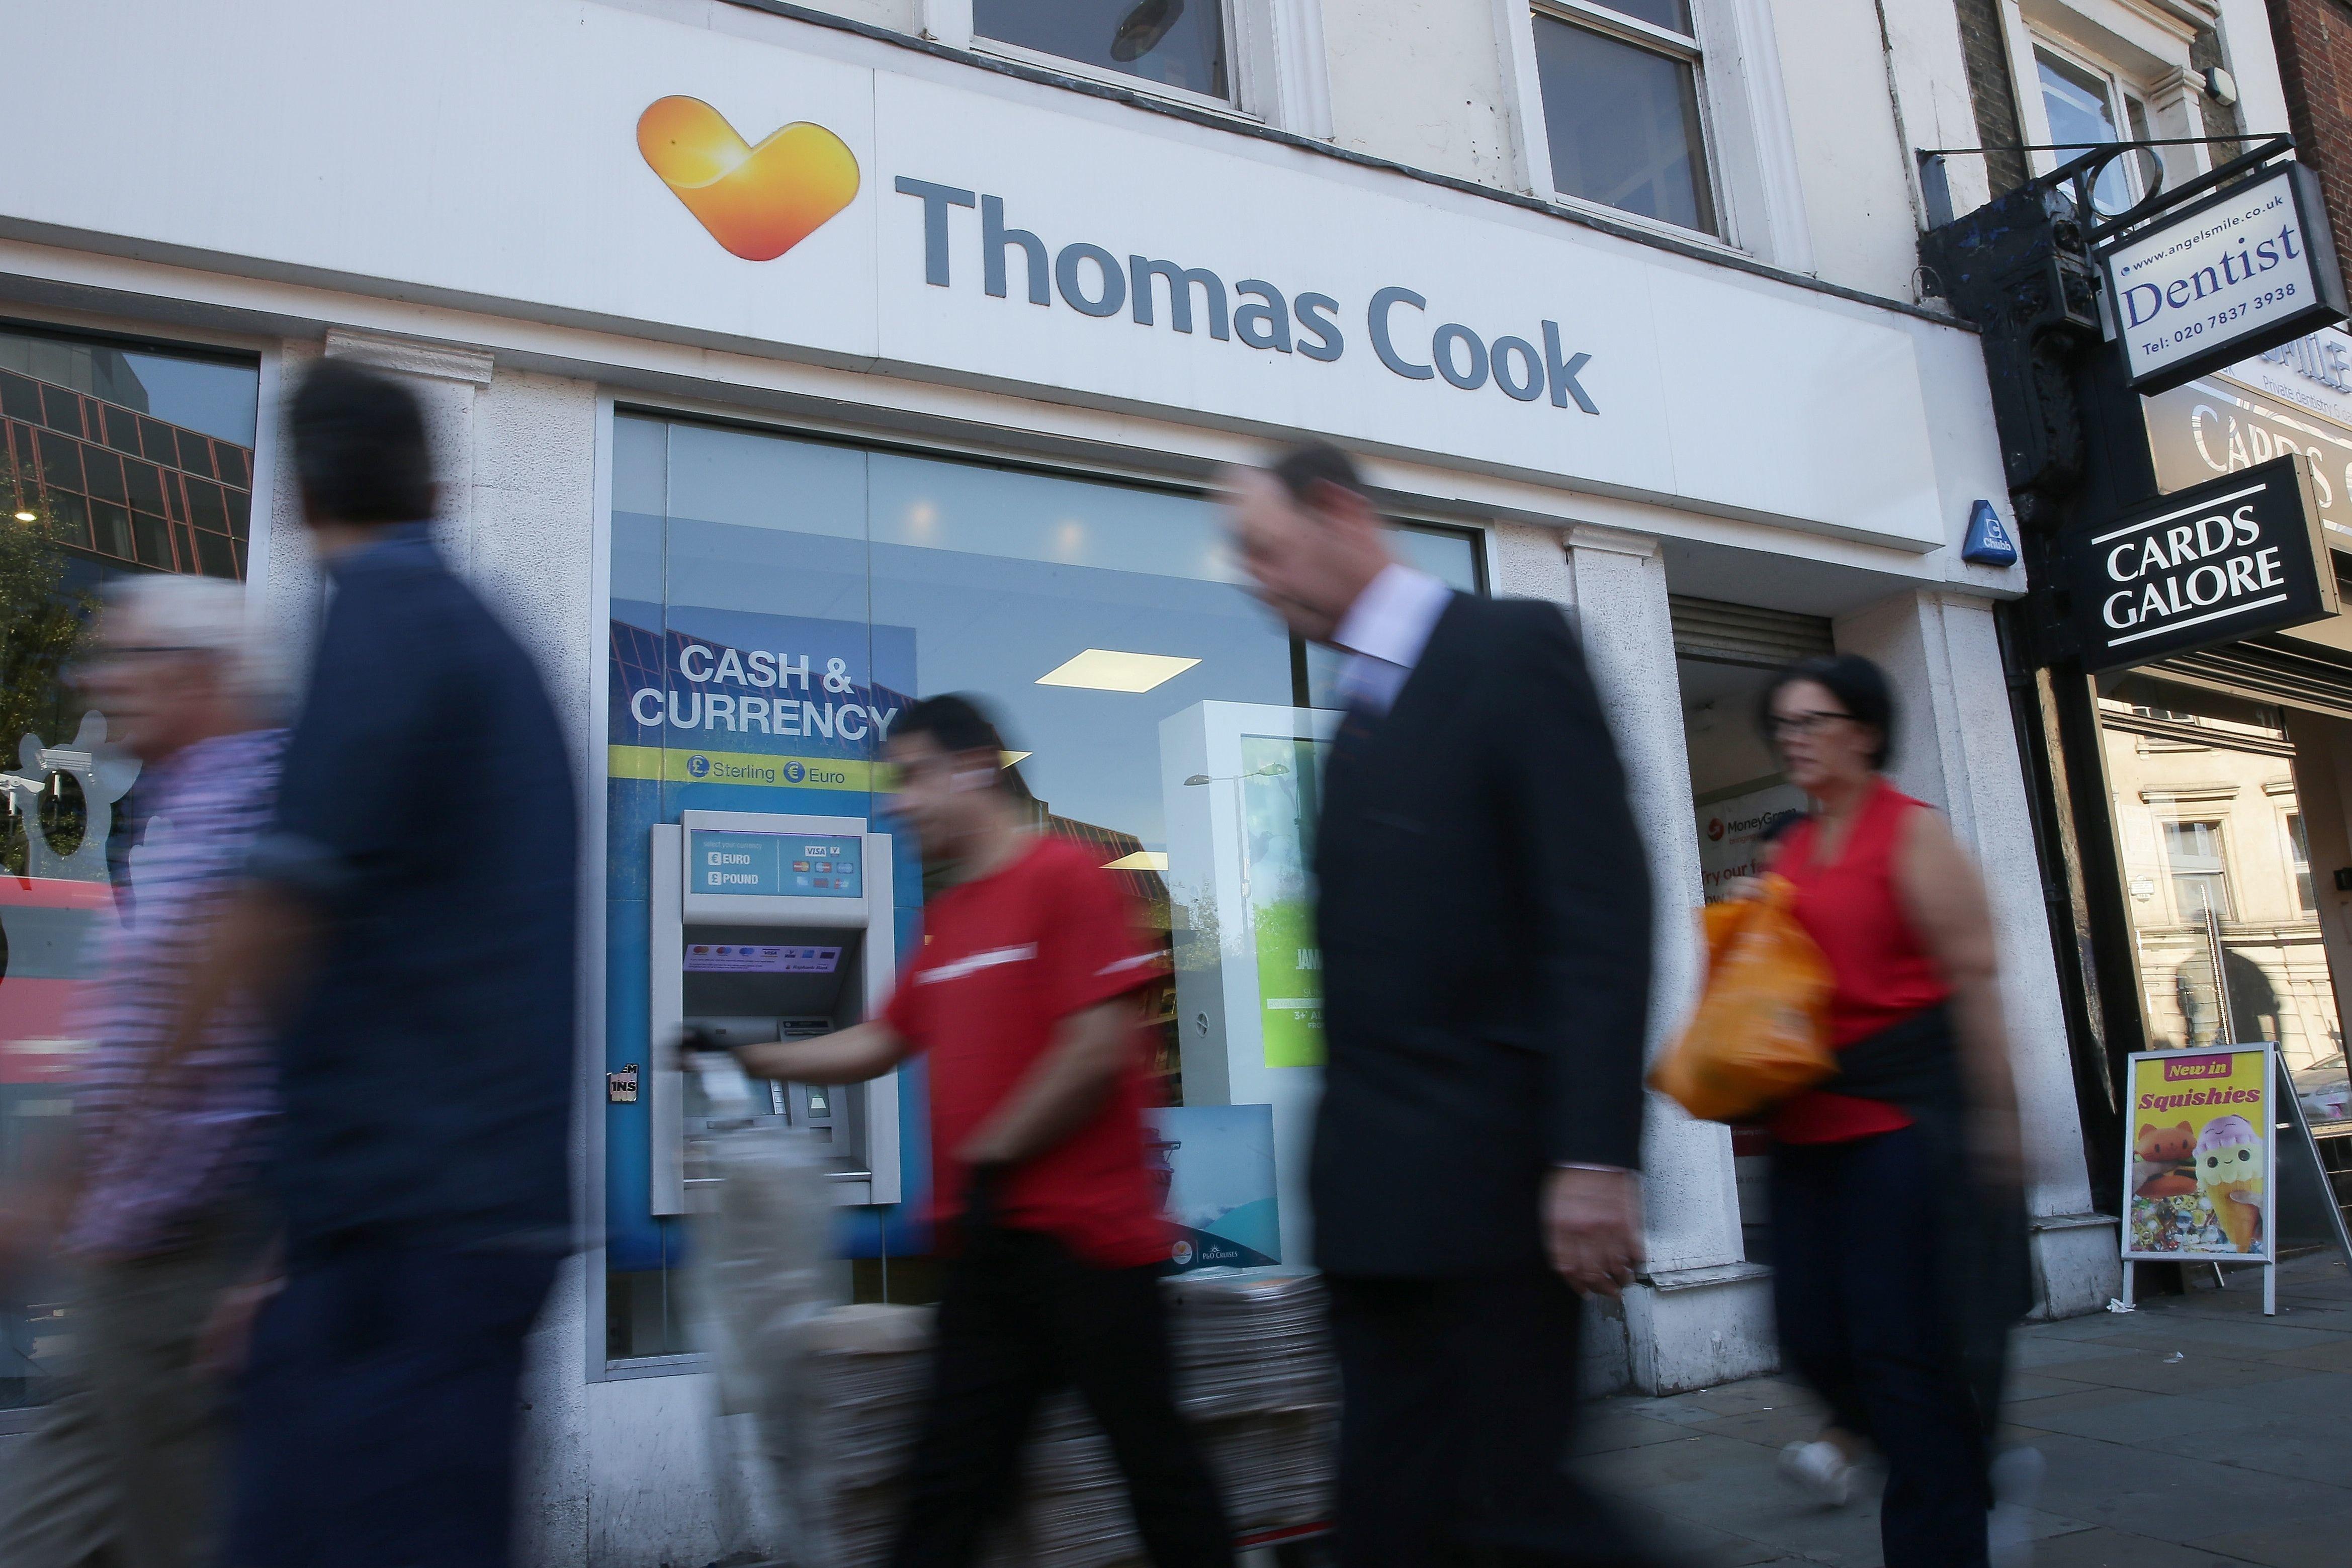 Thomas Cook Blames European Heatwave For Projected Profits